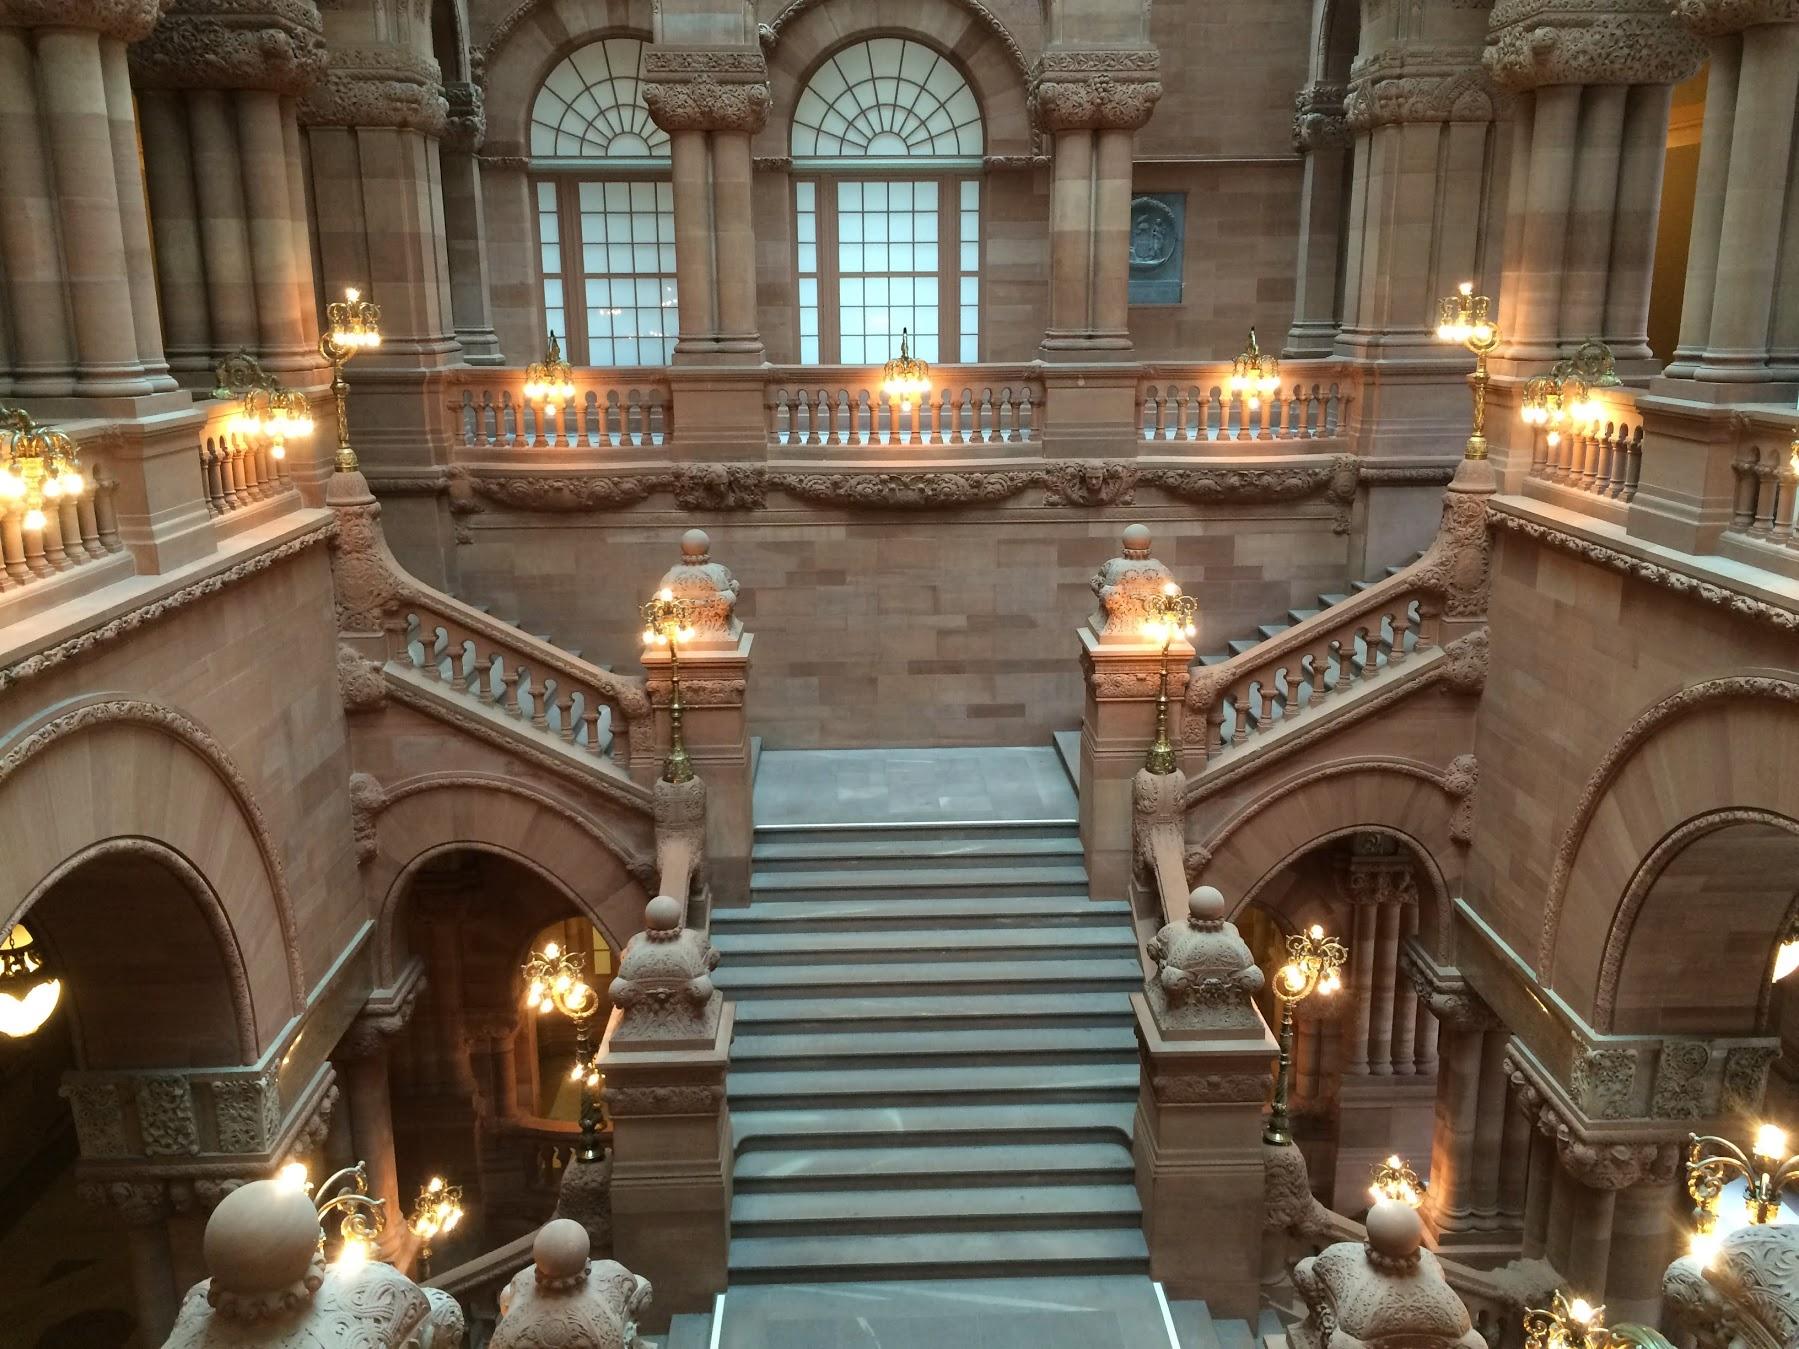 10-Day Waiting Period Legislation in Albany....